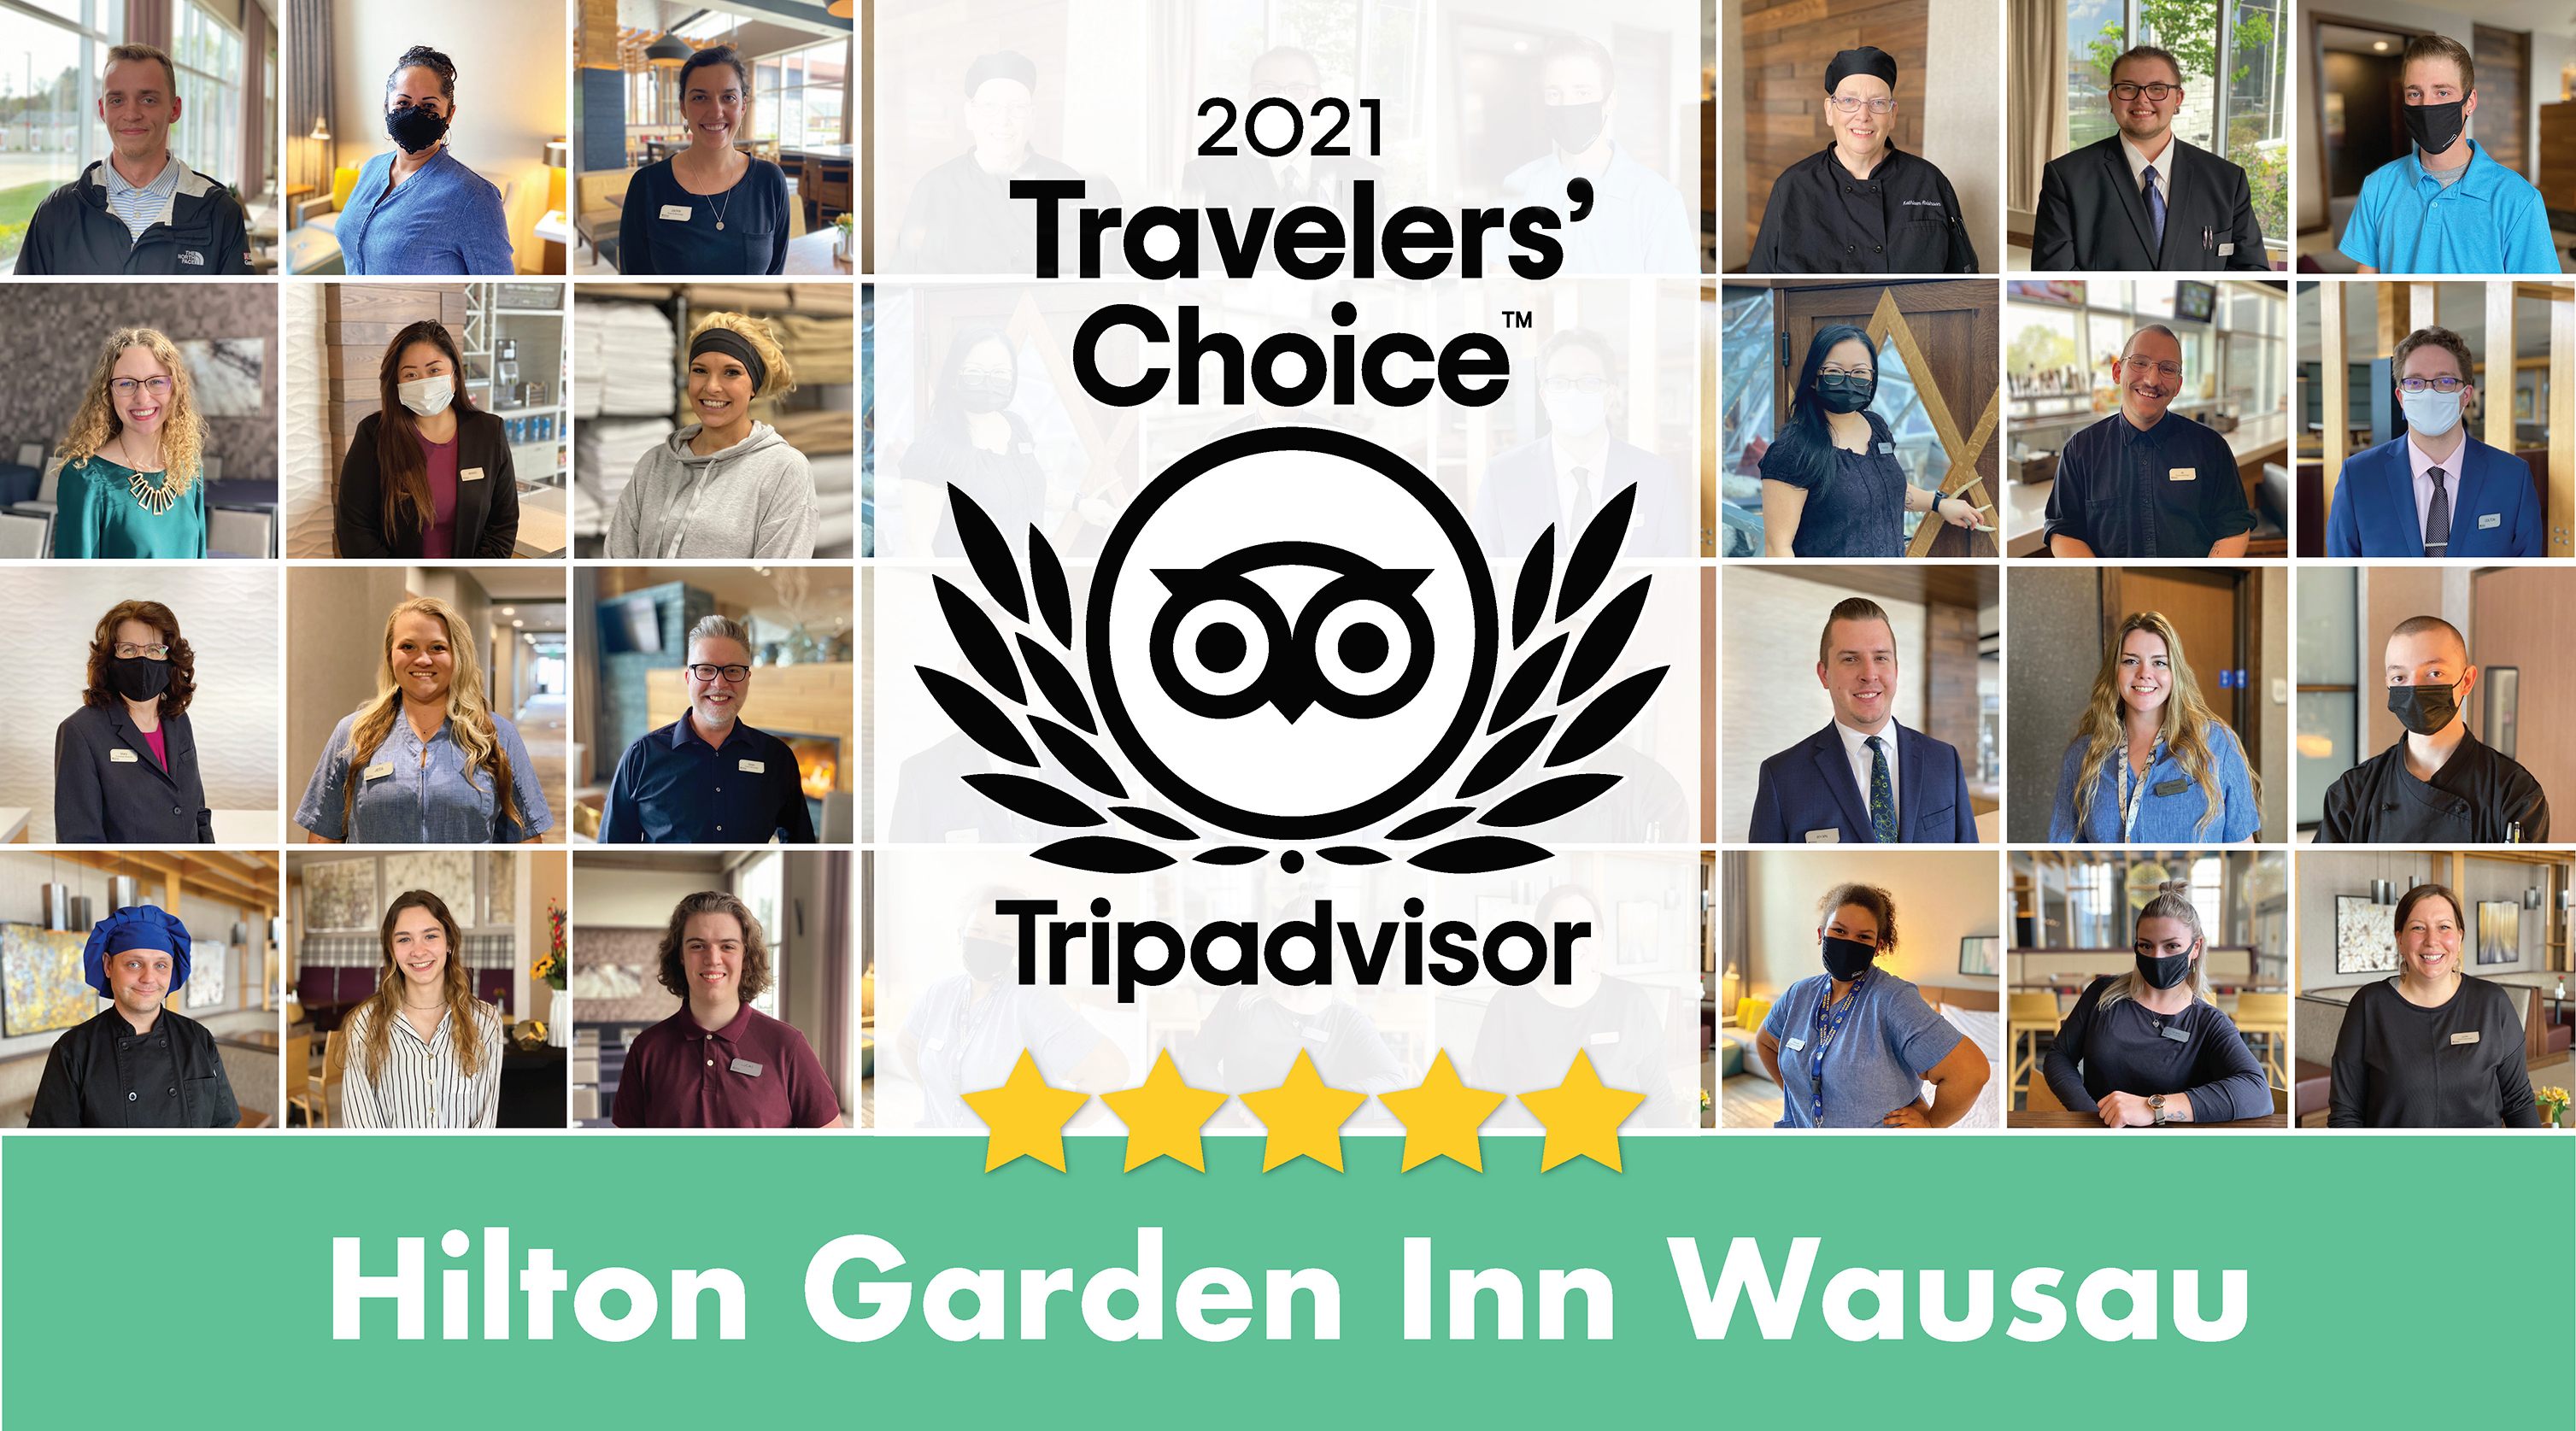 Hilton Garden Inn Wausau Receives Tripadvisor 2021 Travelers' Choice Hotel Award